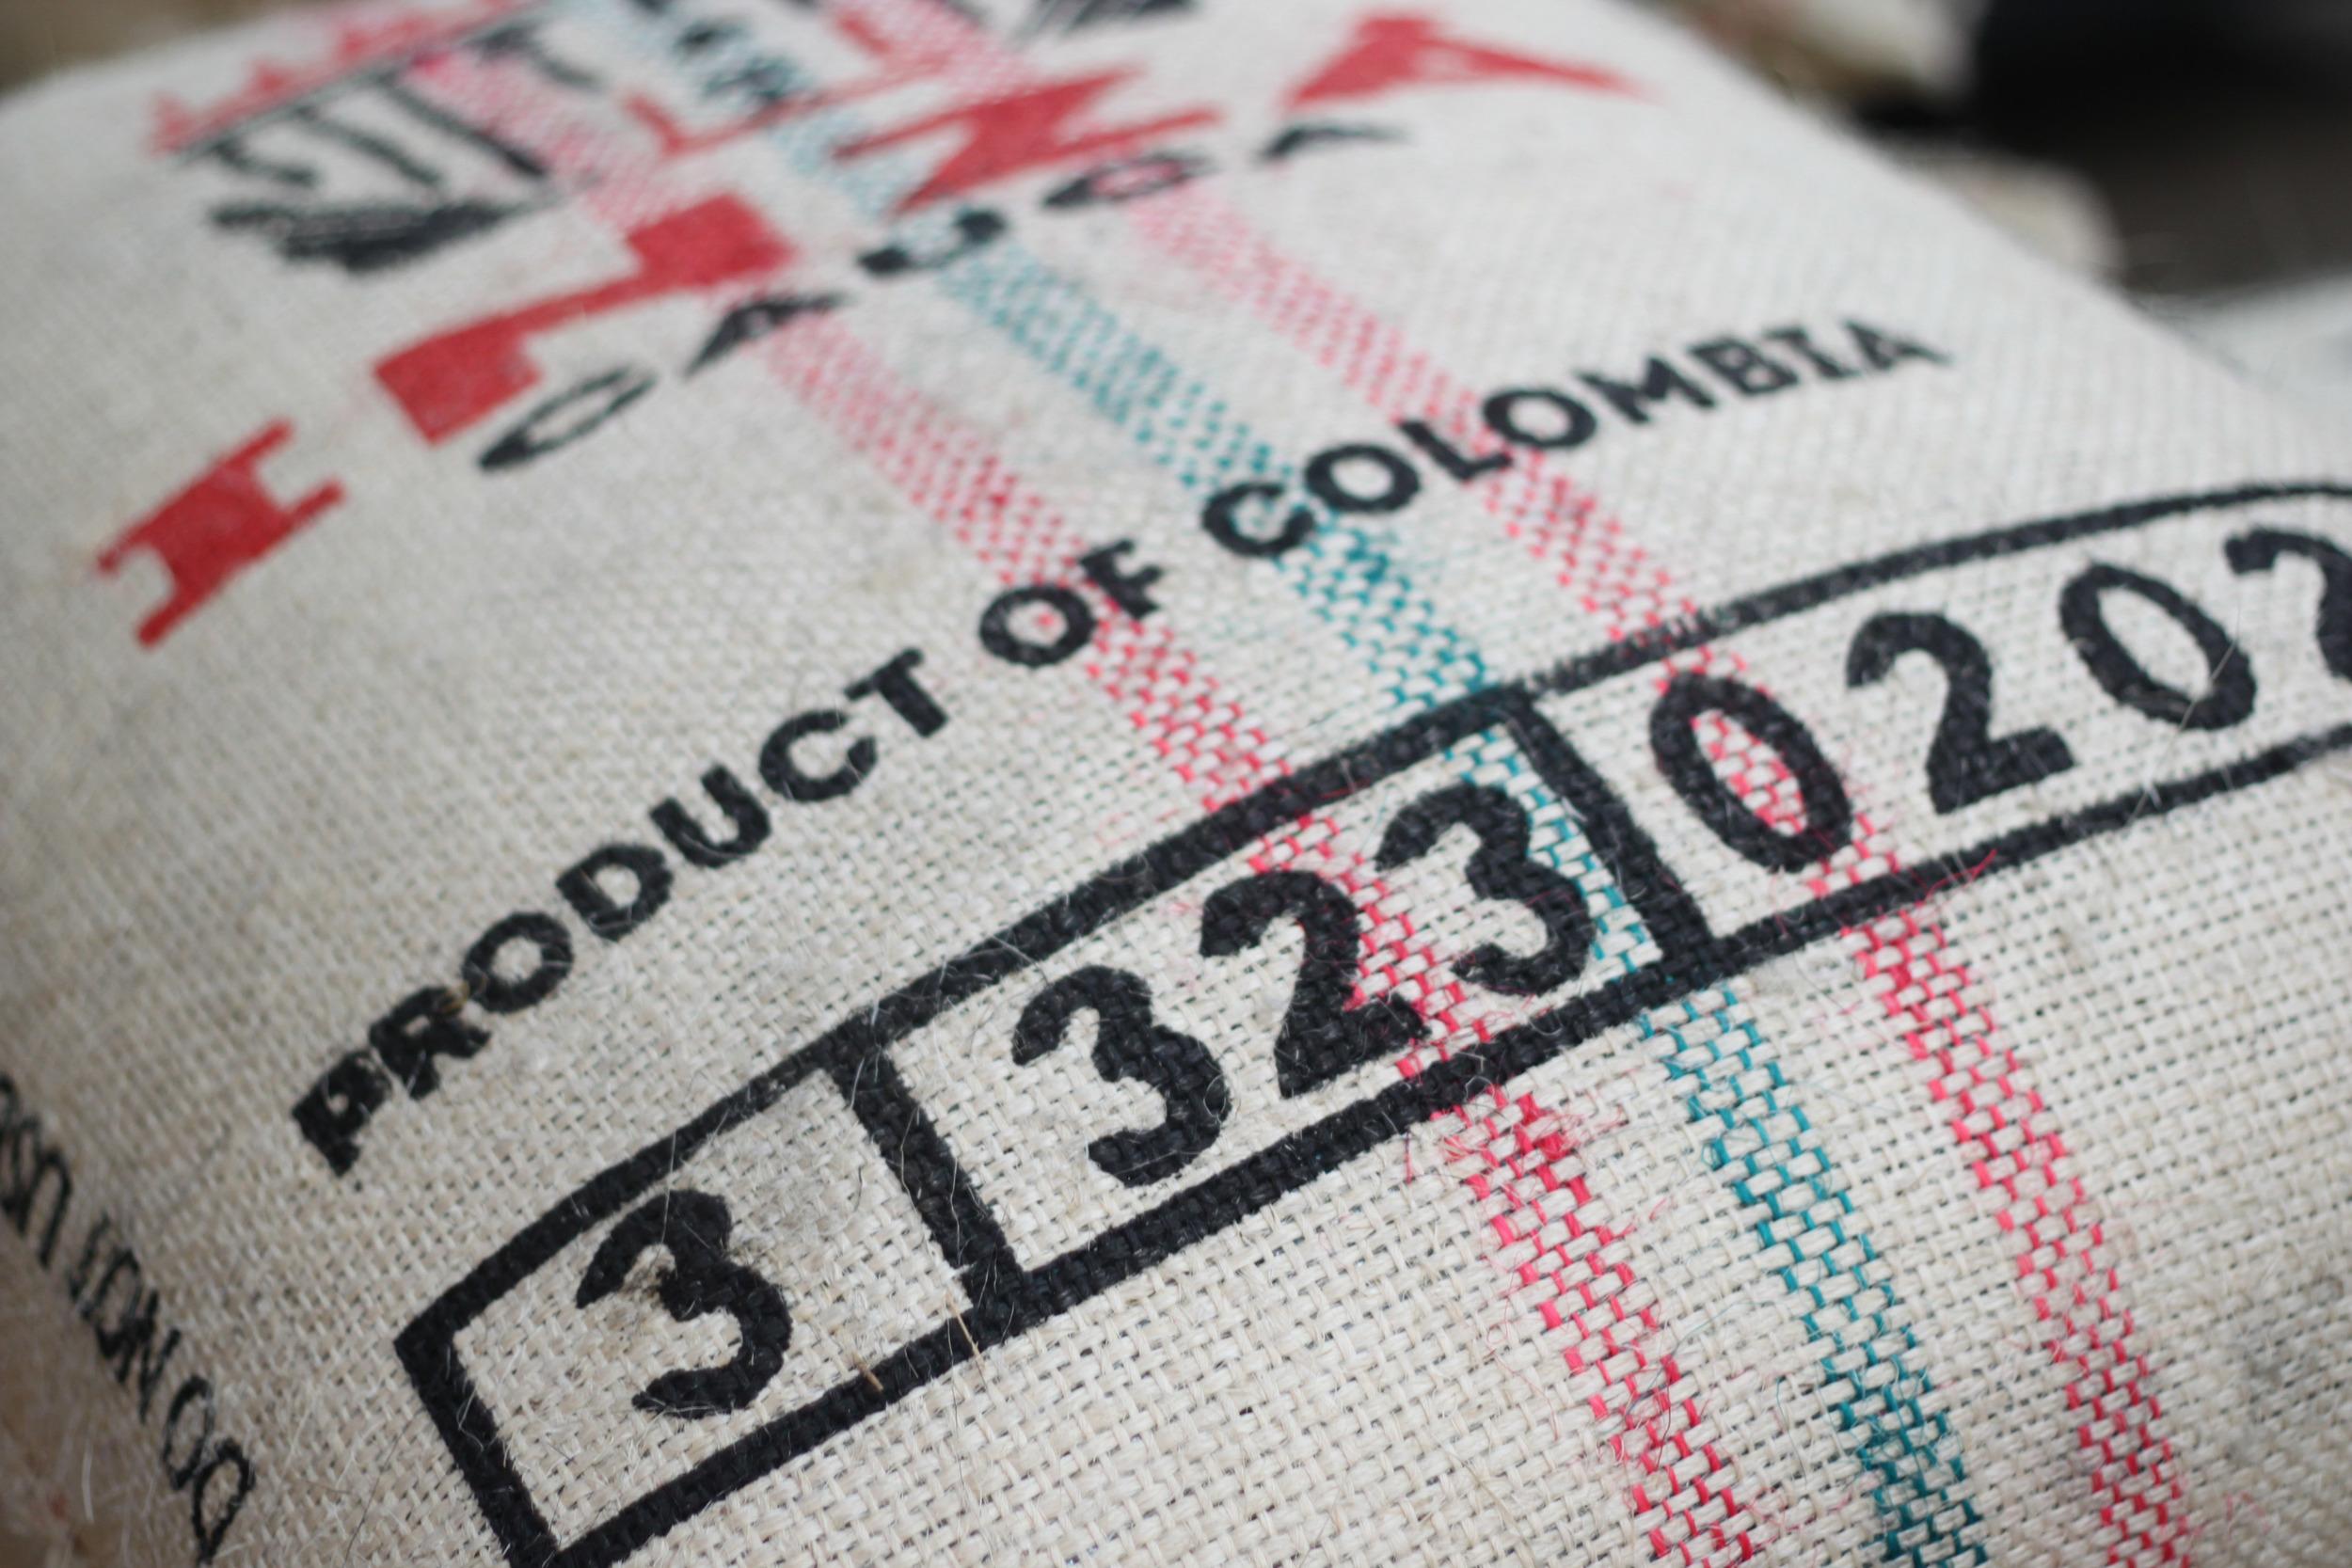 extract_coffee_sack